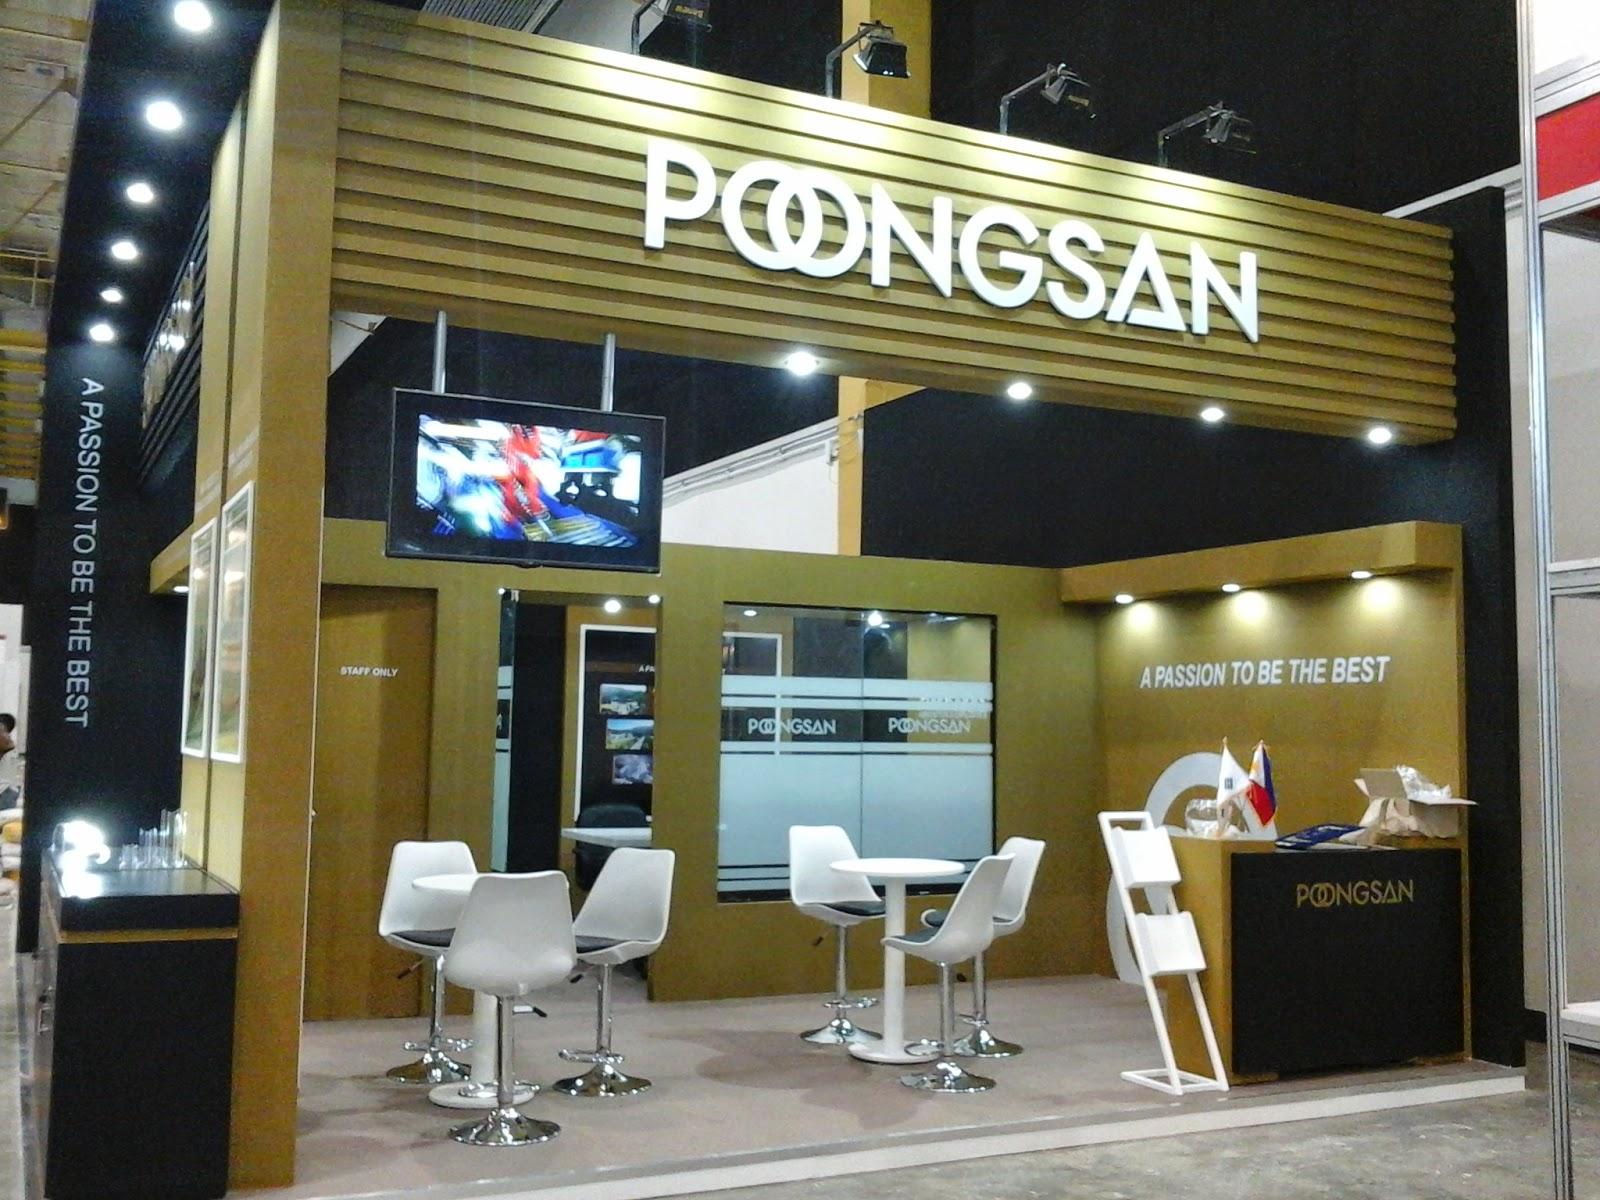 Poongsan ADAS 2014 Trade Show Booth